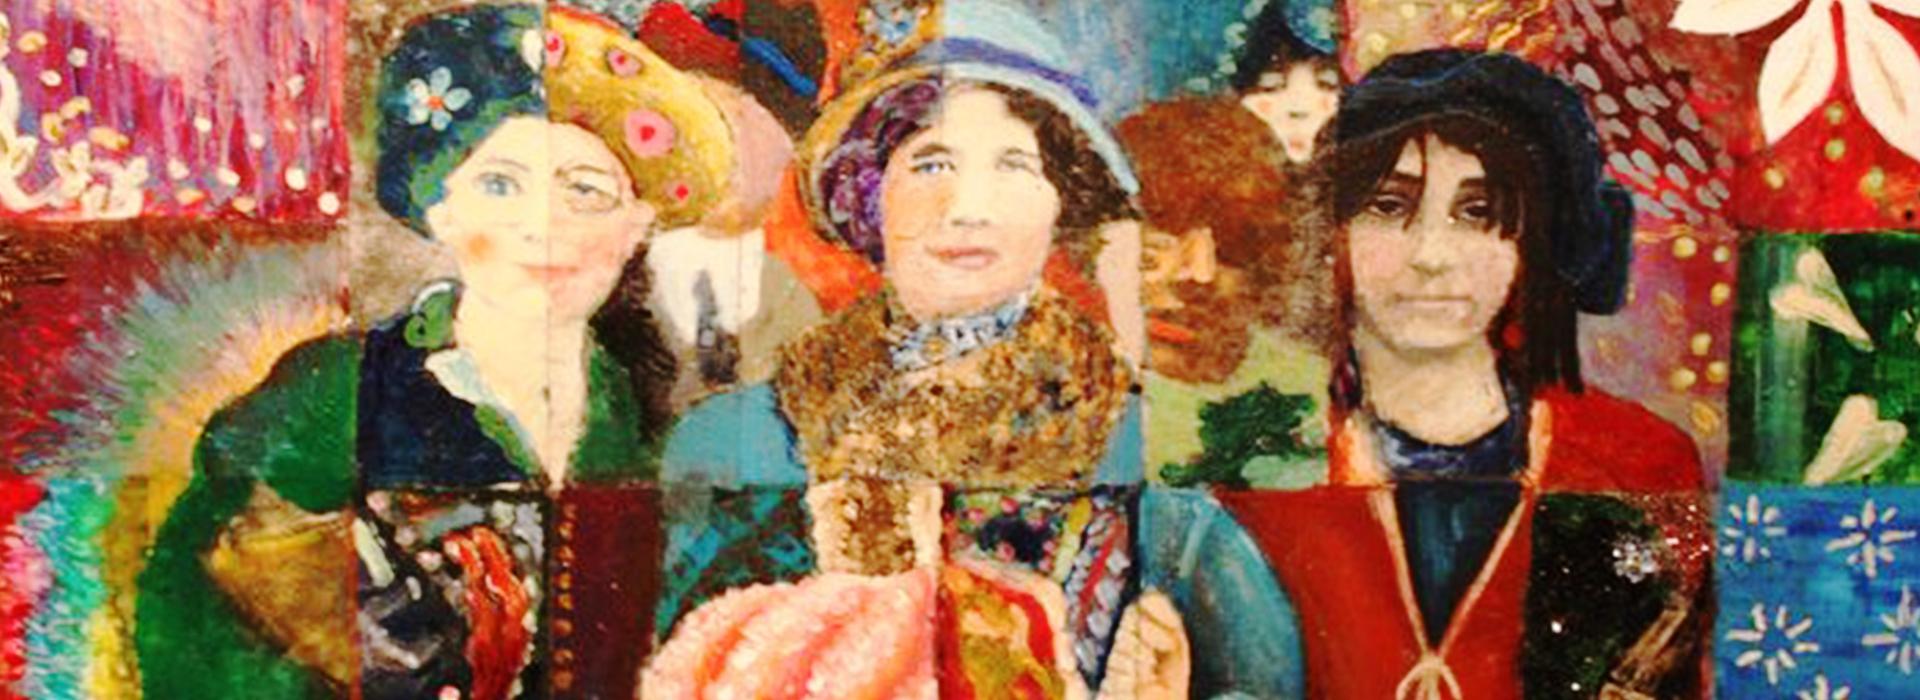 Woman traveling painting4.jpg